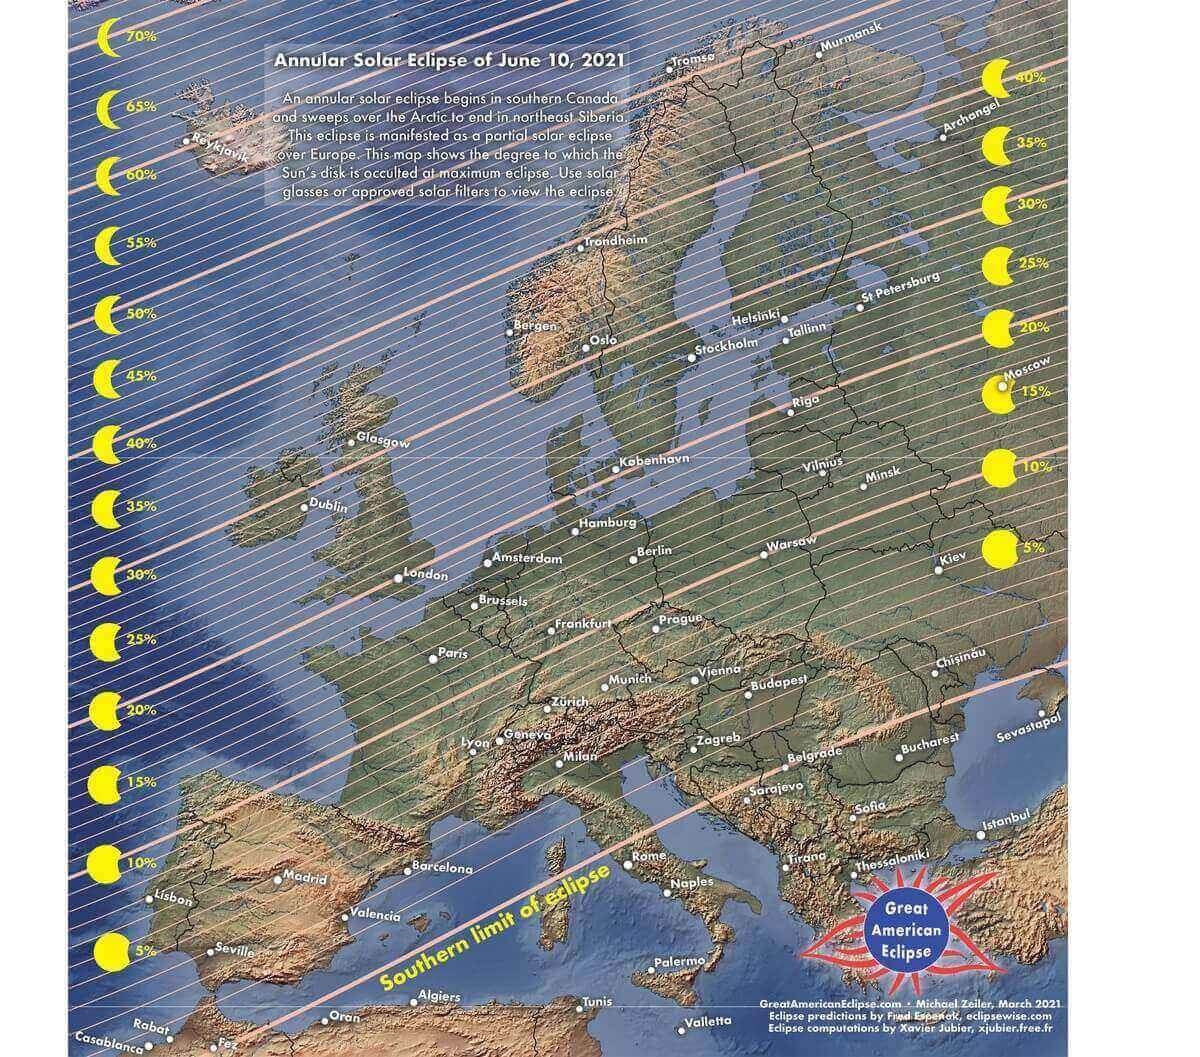 annular-solar-eclipse-2021-europe